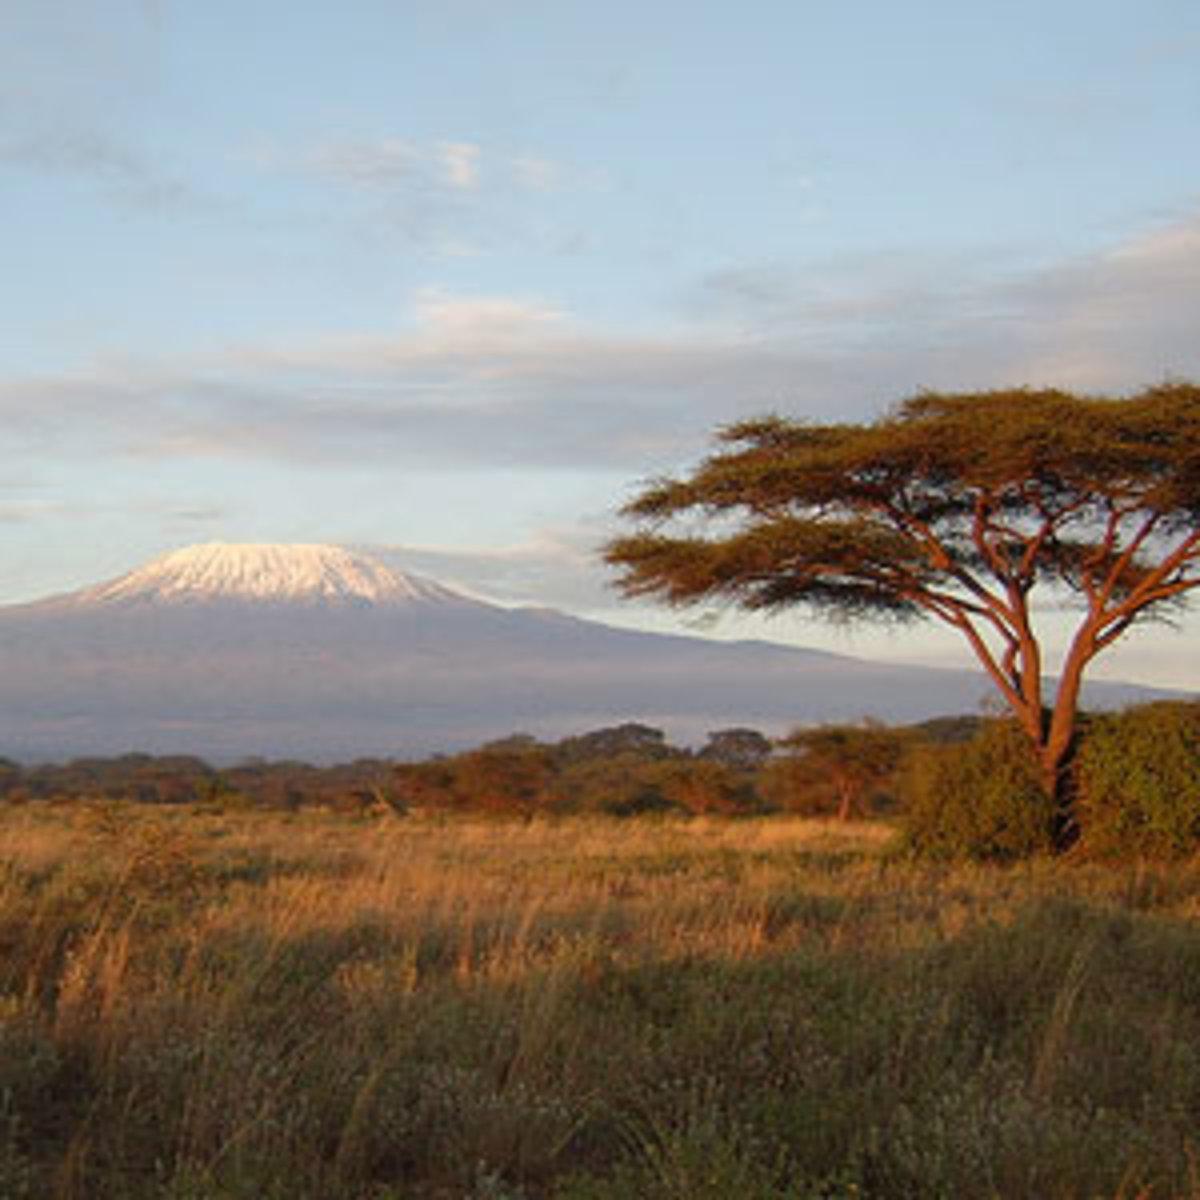 Kenyan game reserve with Mt Kilamanjaro (in Tanzania) in the distance. Kilamanjaro is 3 degrees south of the equator.